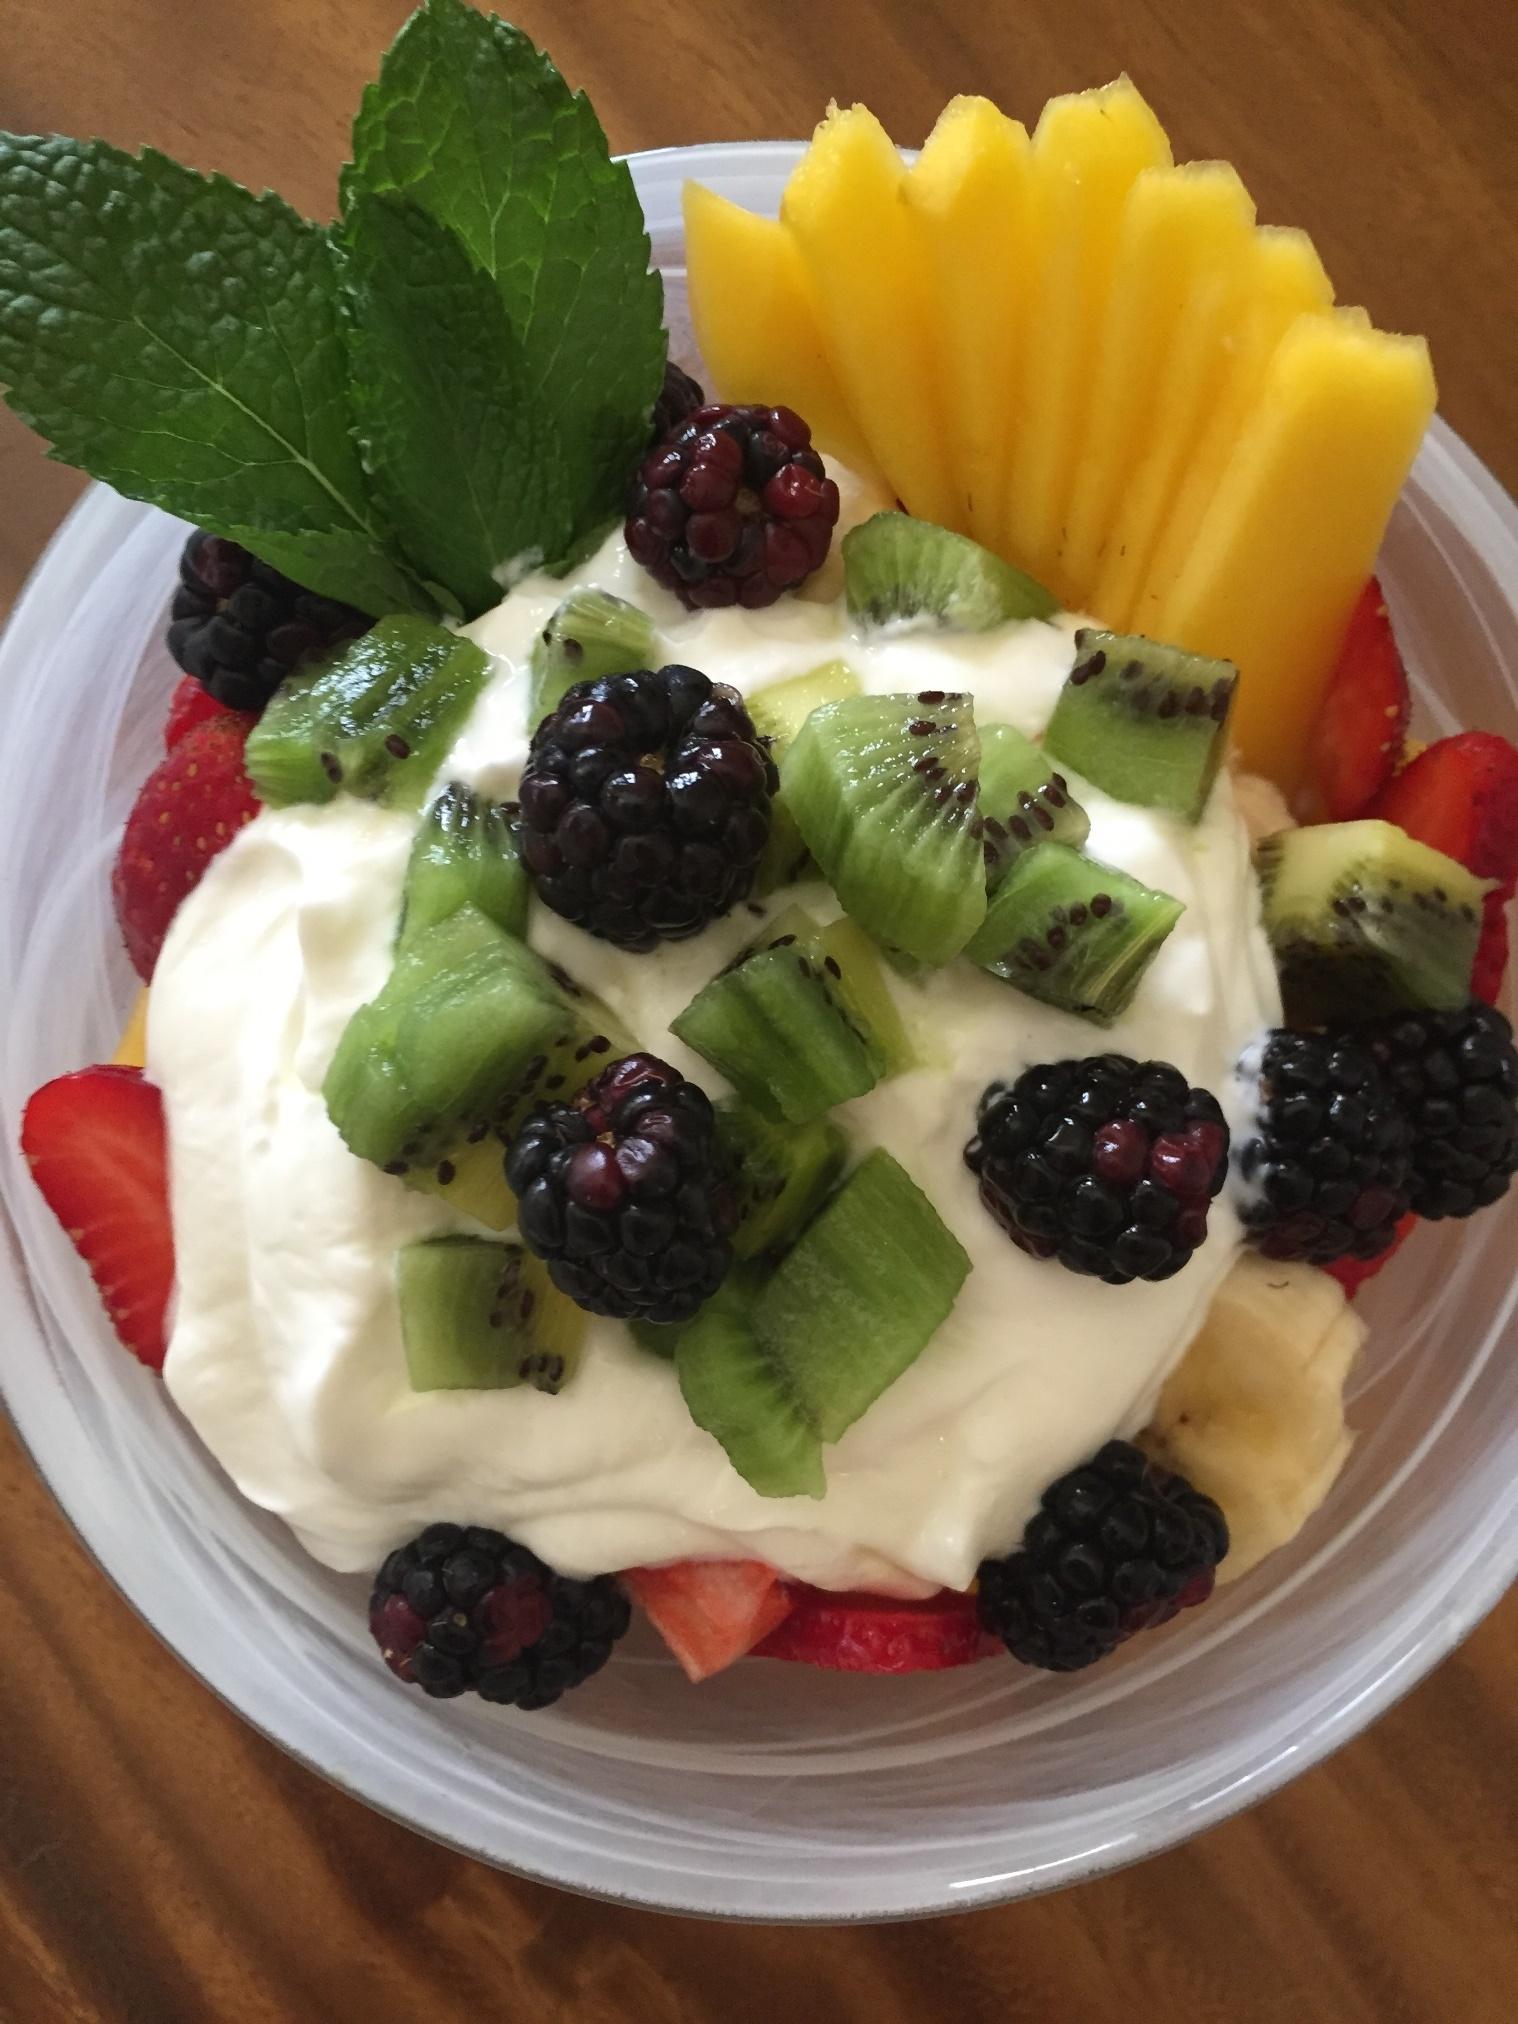 Tropical Fruit Bowl with Greek Yogurt